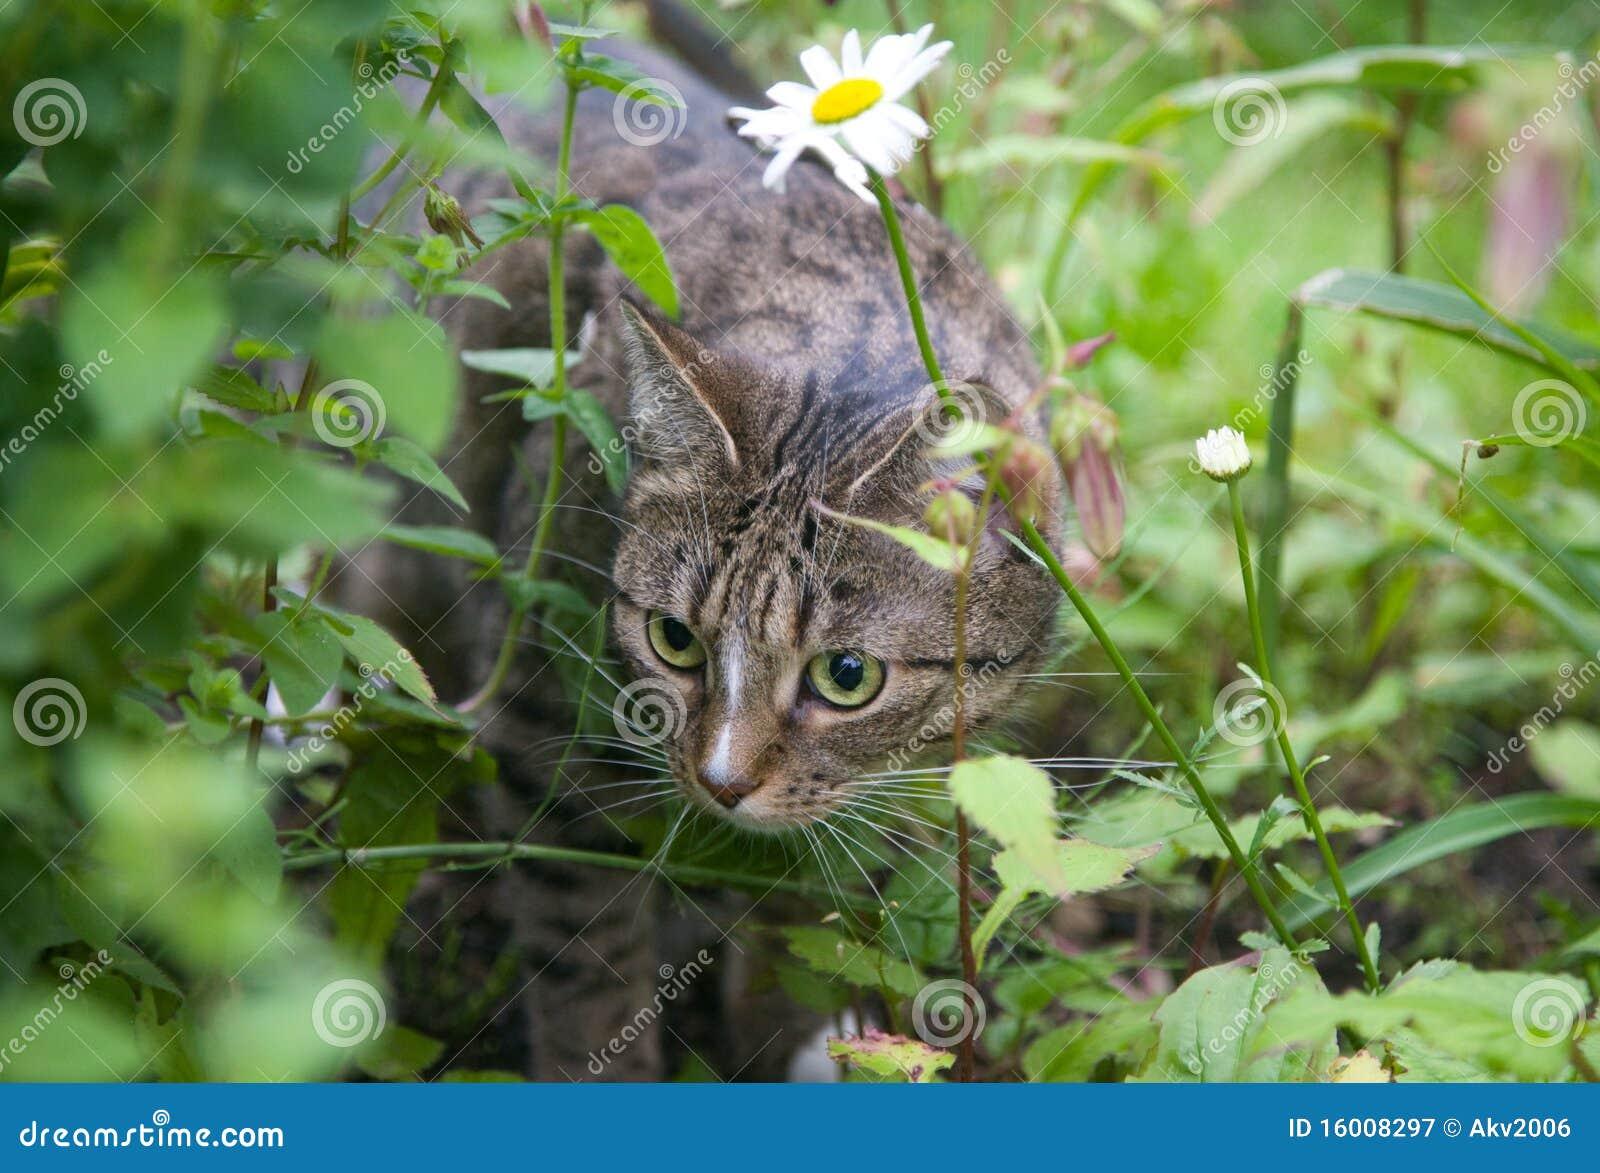 chat chassant dans l 39 herbe image stock image du chat 16008297. Black Bedroom Furniture Sets. Home Design Ideas